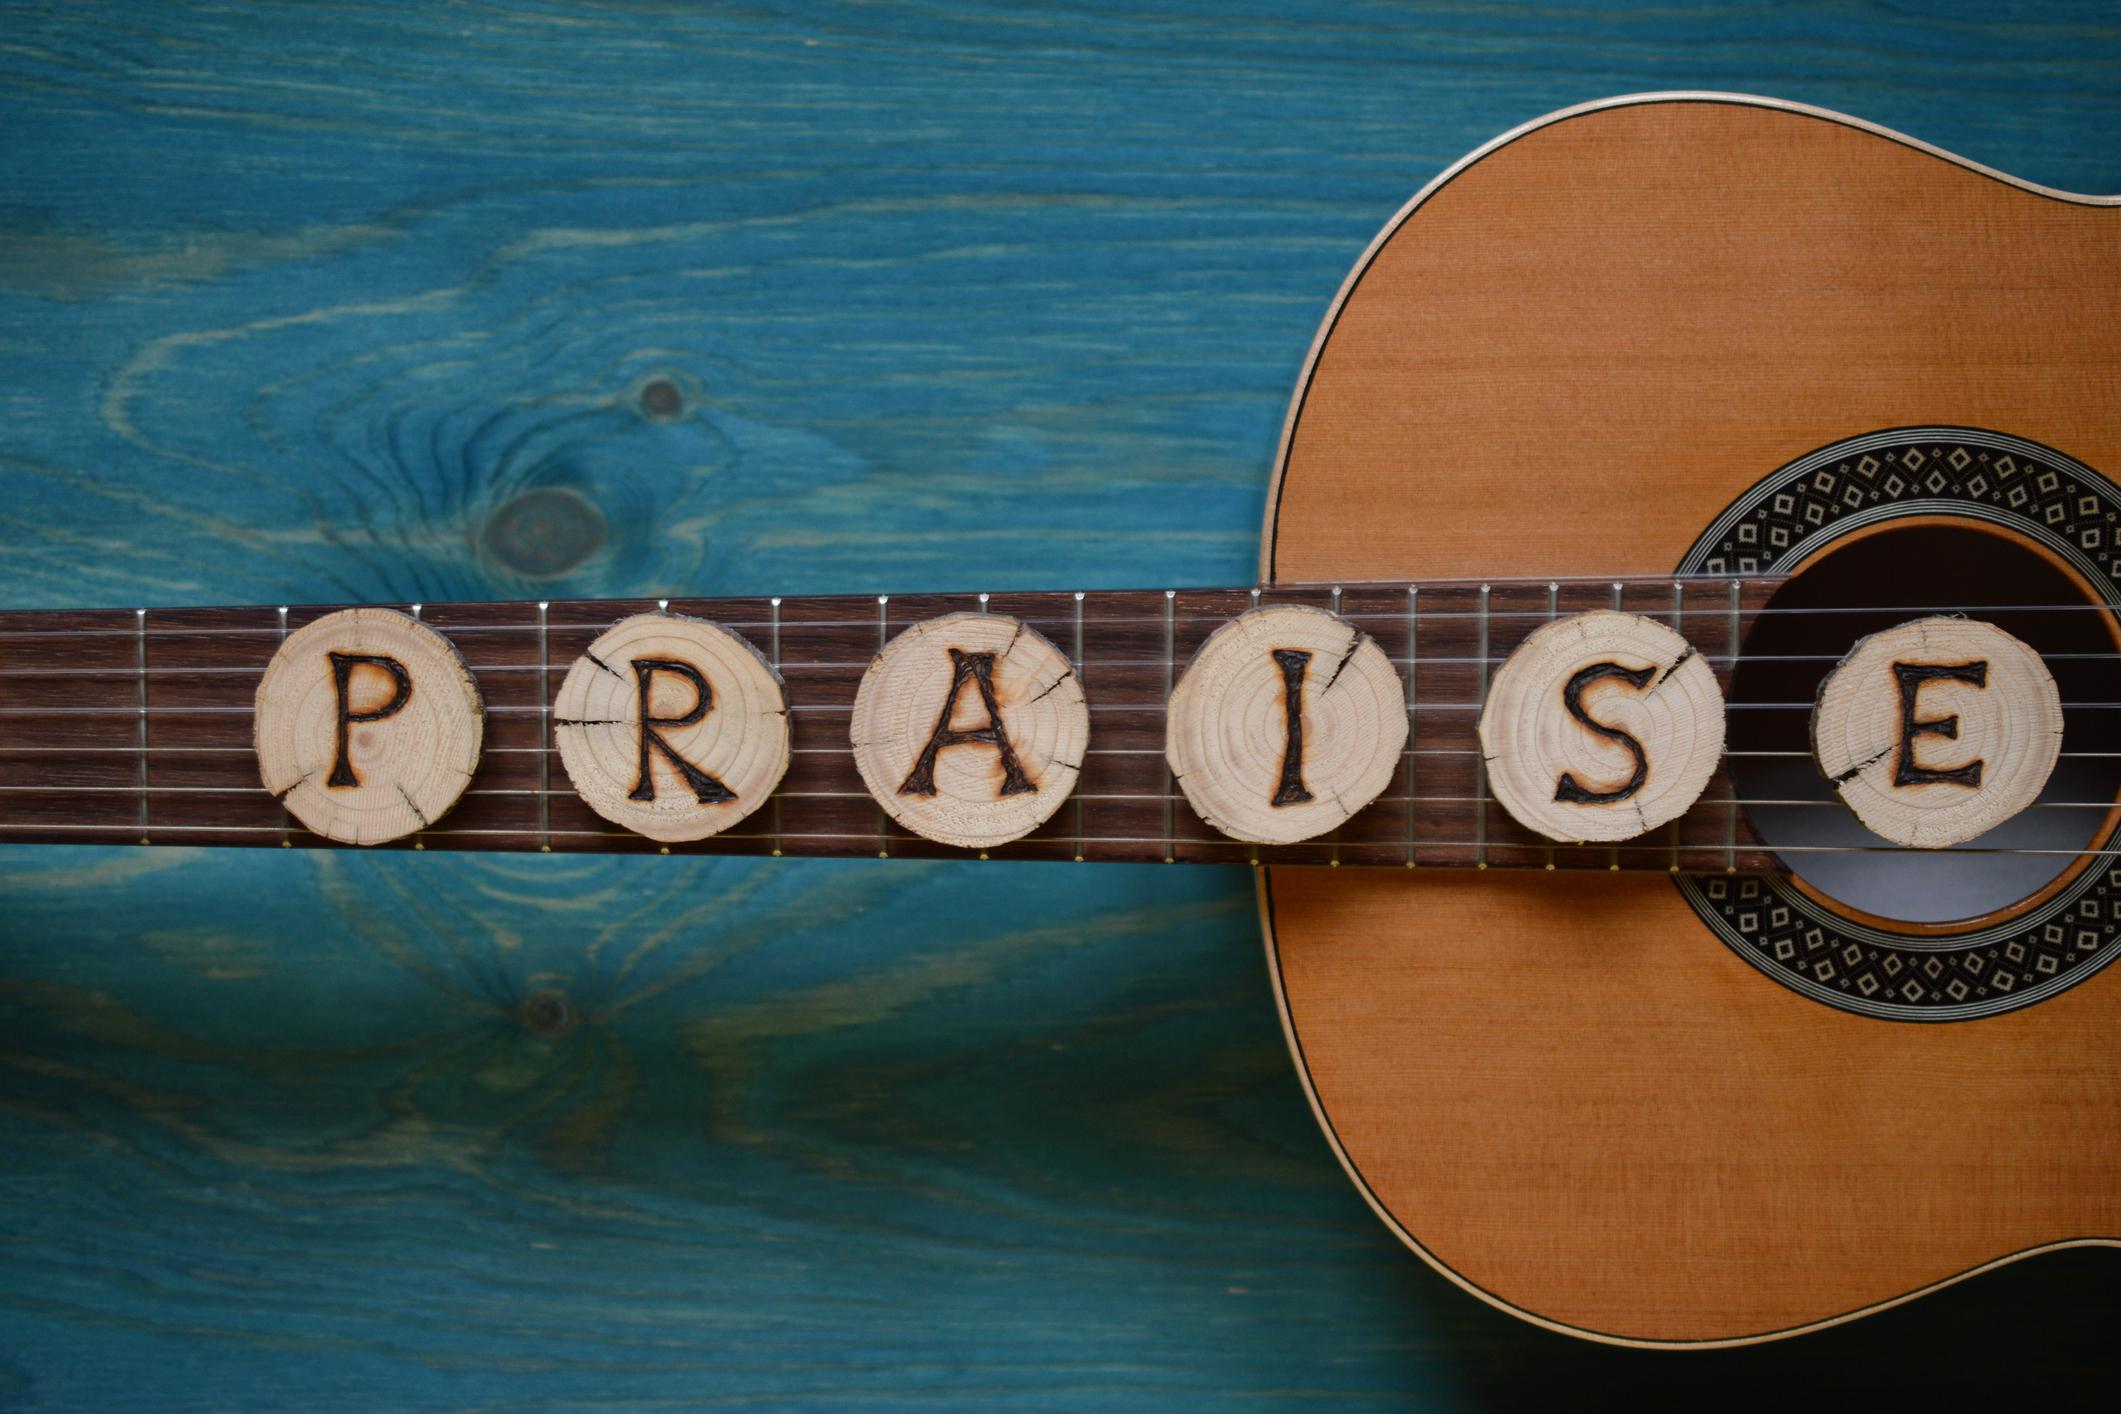 Finding Free Gospel Guitar Chords And Lyrics